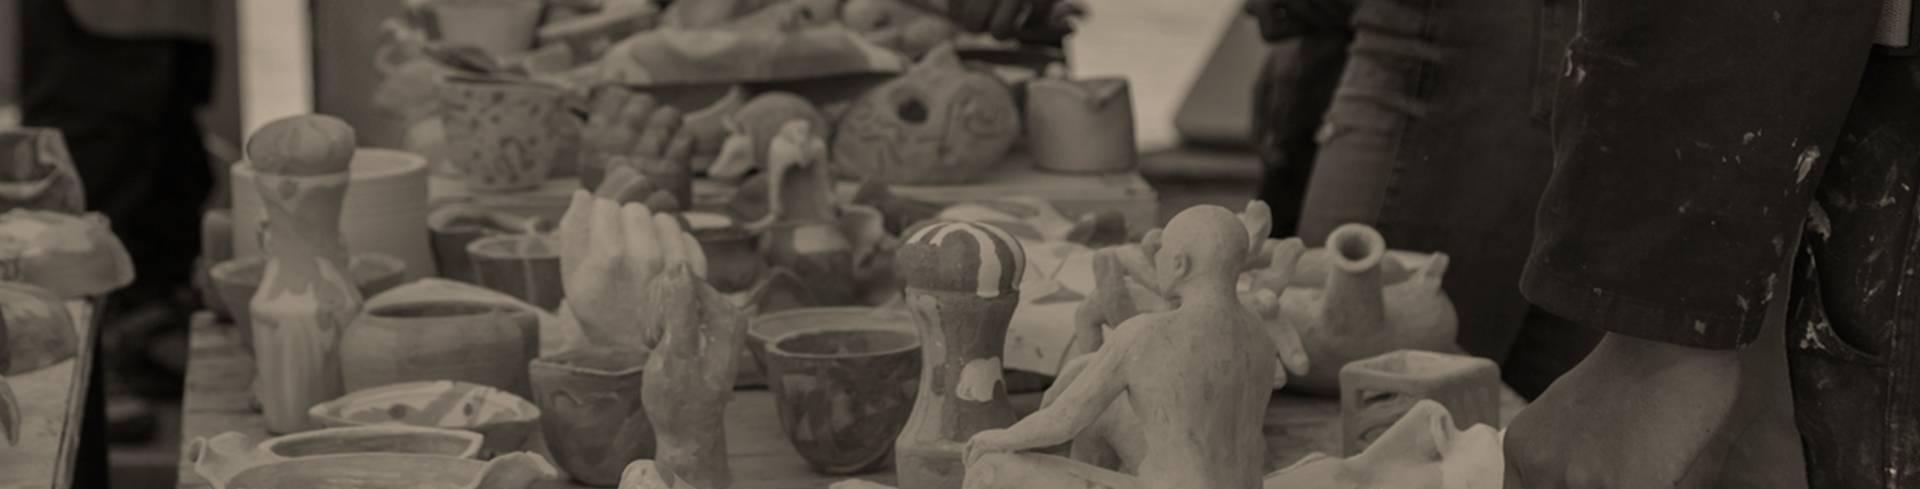 Taller Modelado cerámica